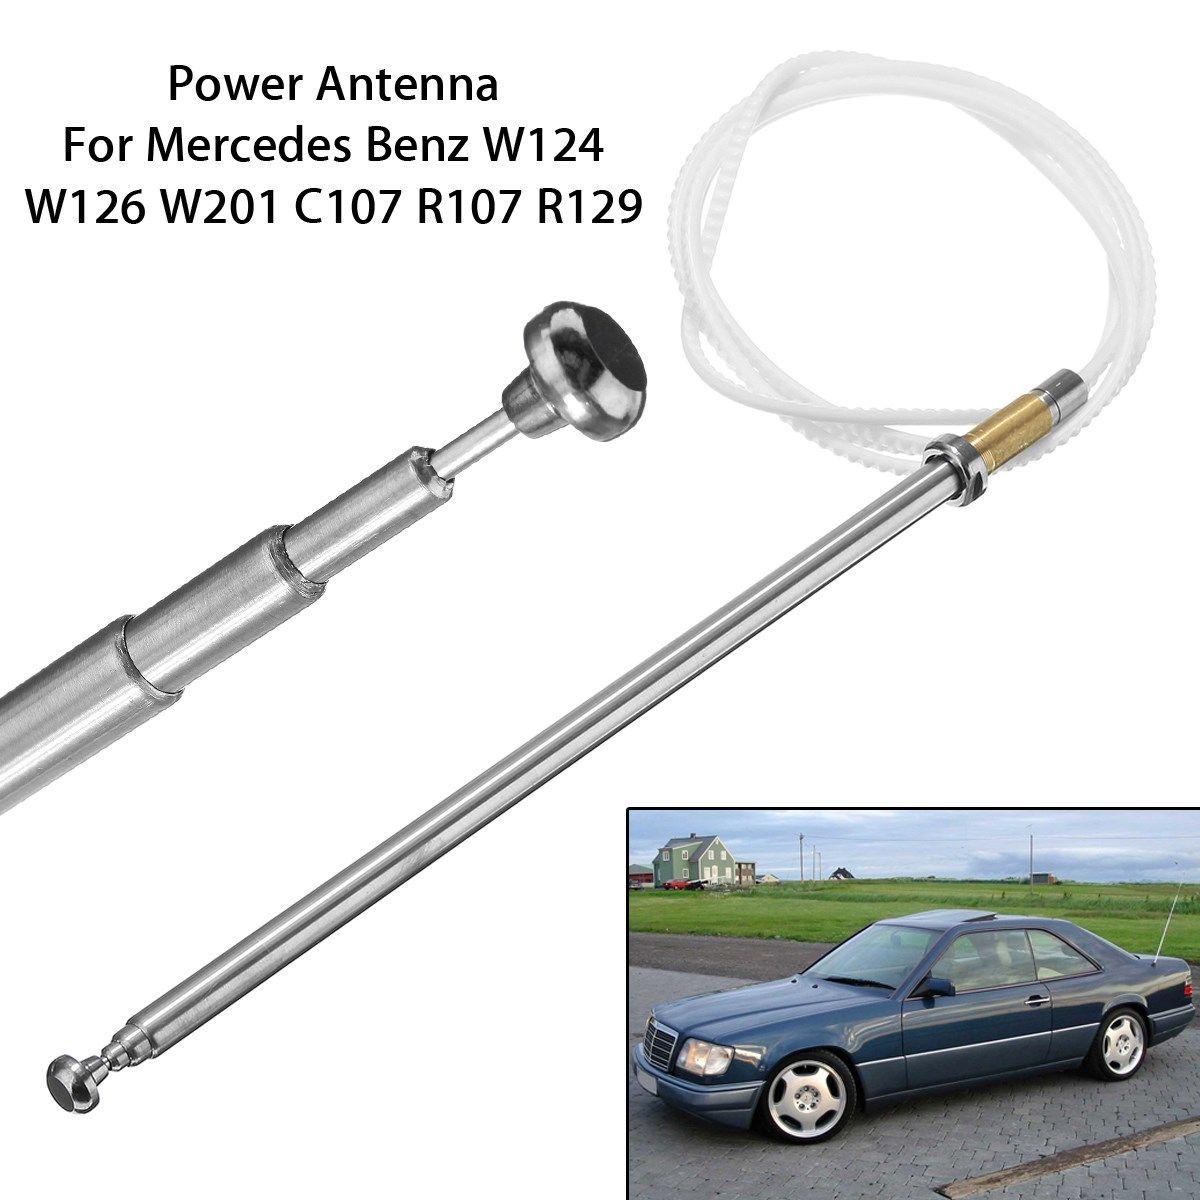 Power Antenna Aerials AM FM Radio Mast Cord For Mercedes-Benz W124 W126 W201 C107 R107 Tooth Core